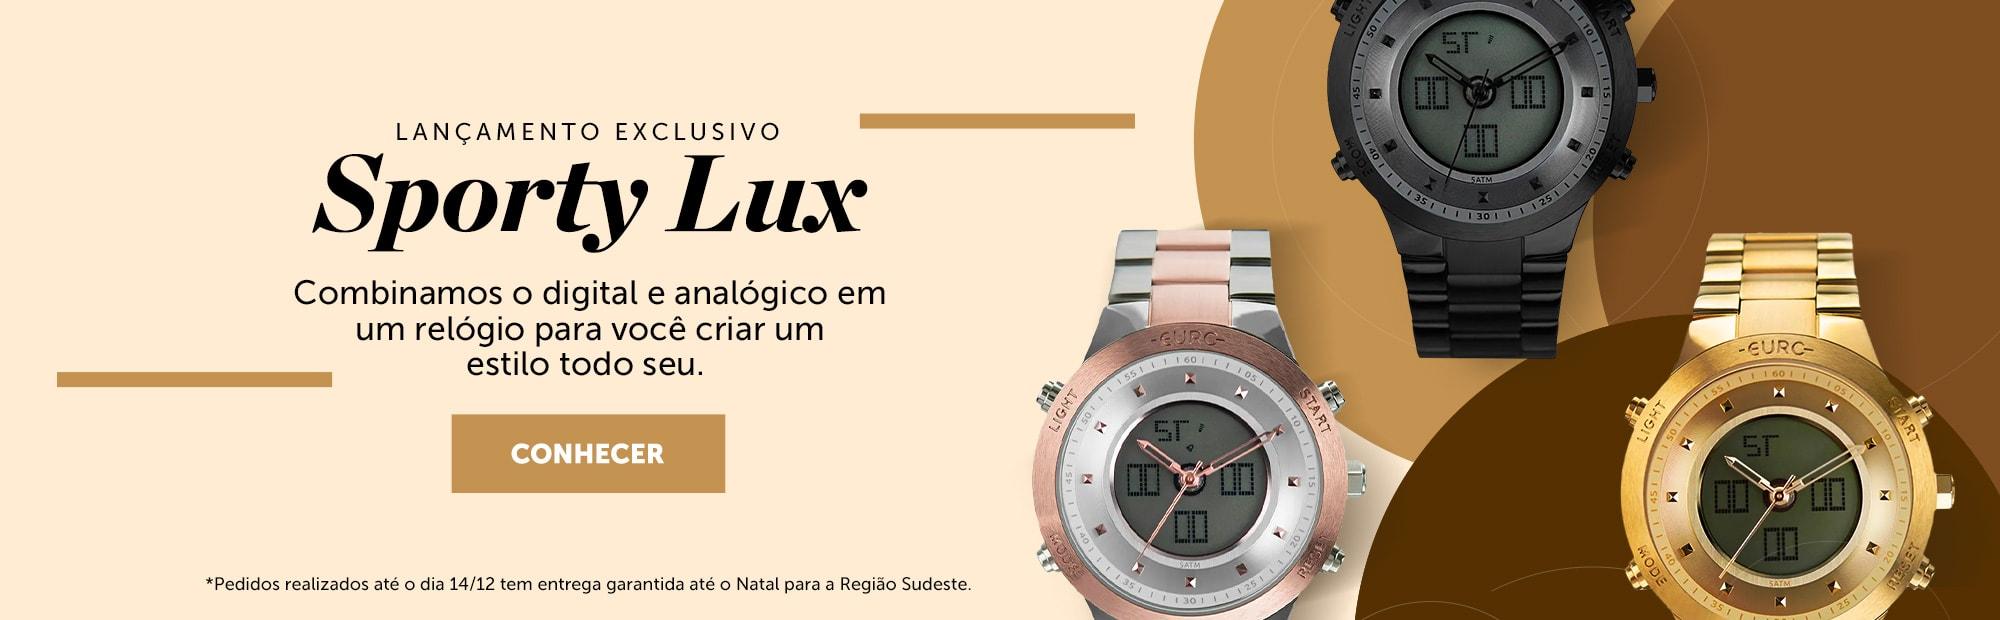 Sporty Lux